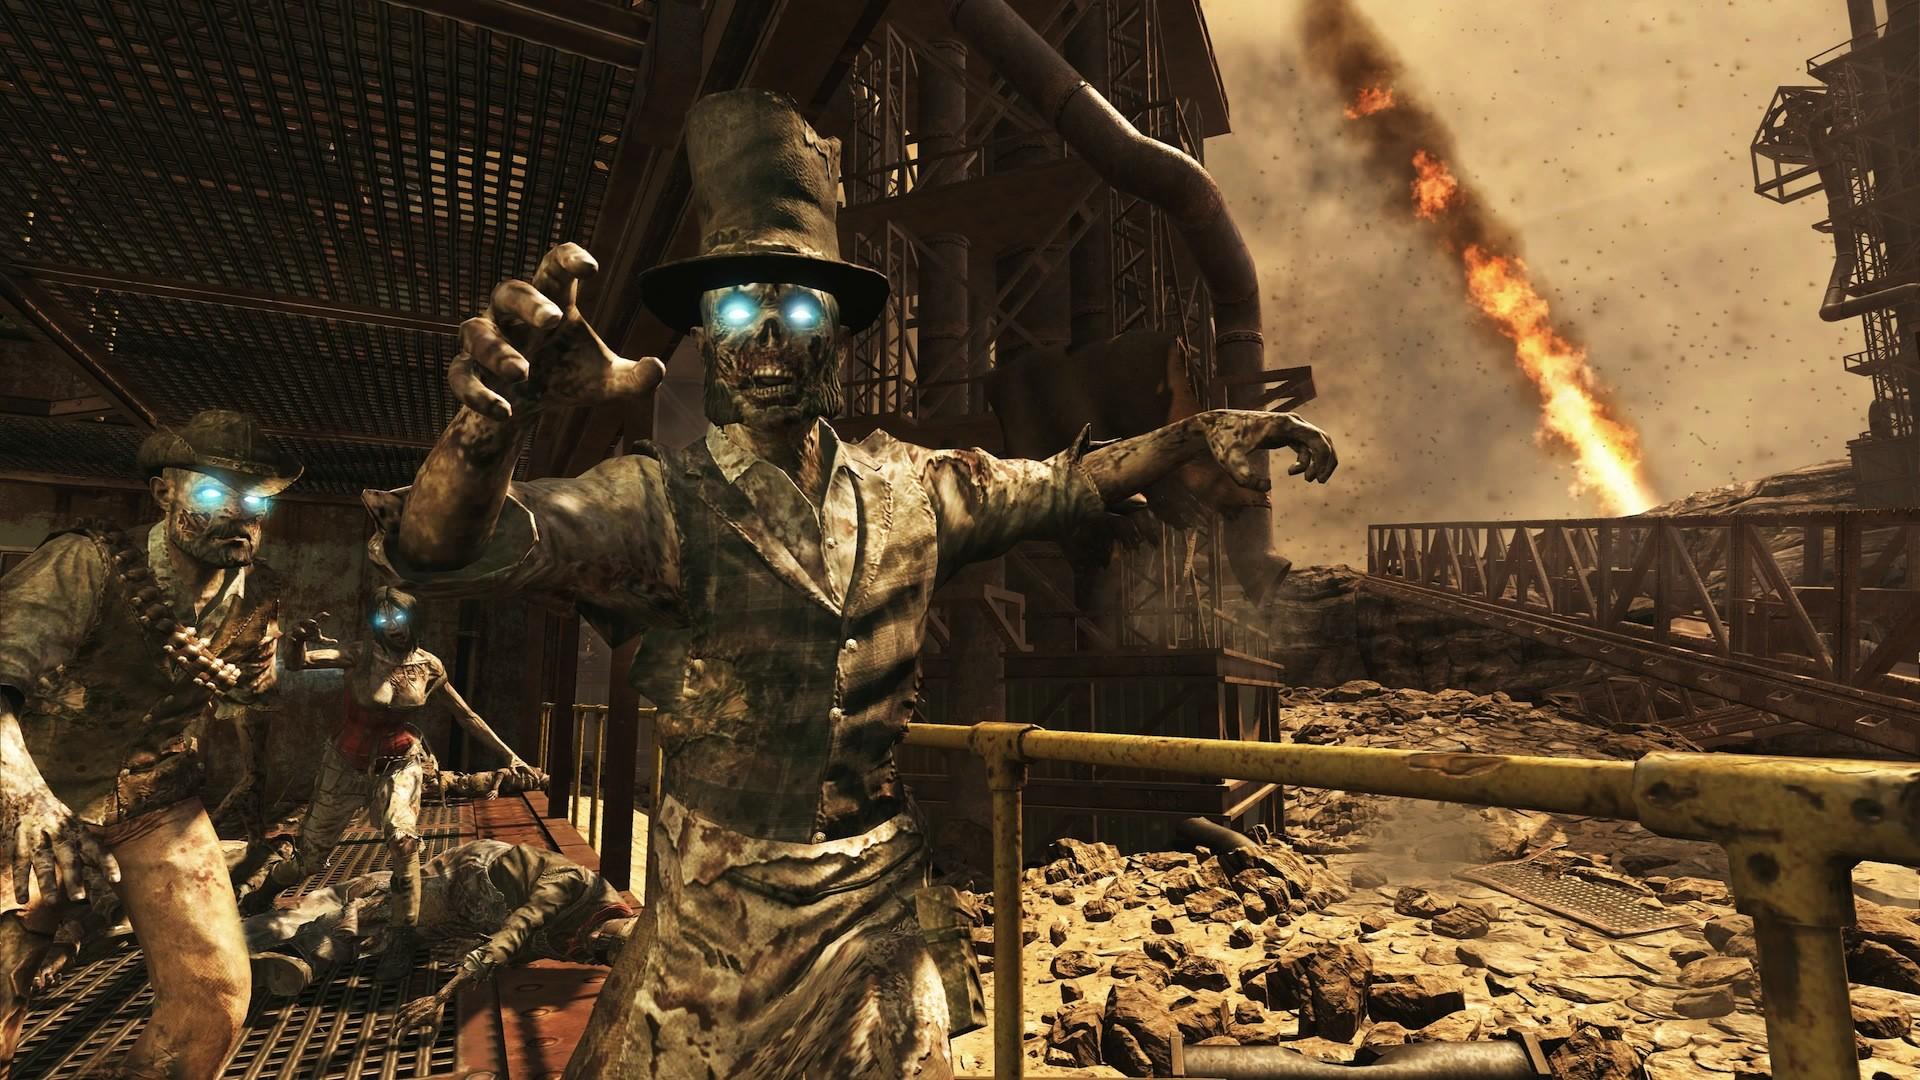 Jestingstock.com Call Of Duty Black Ops 2 Zombies Wallpaper 1080p